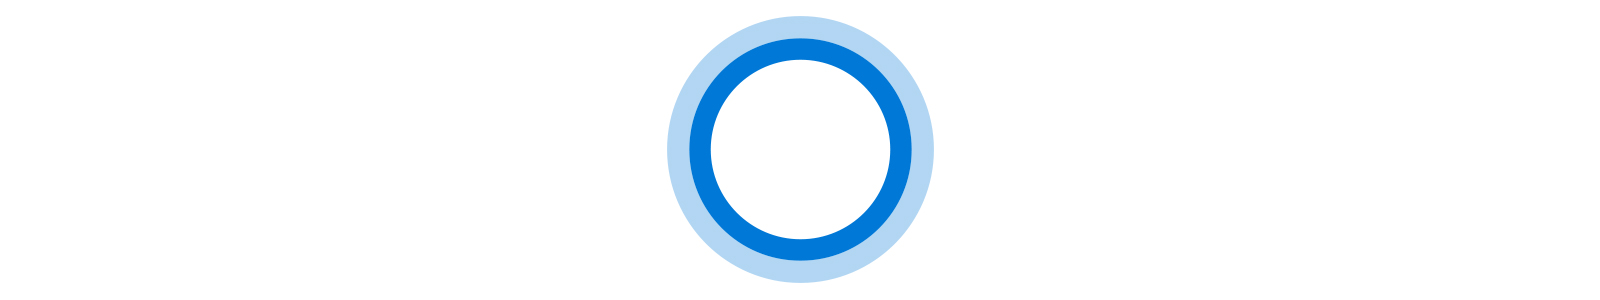 Icona animata di Cortana